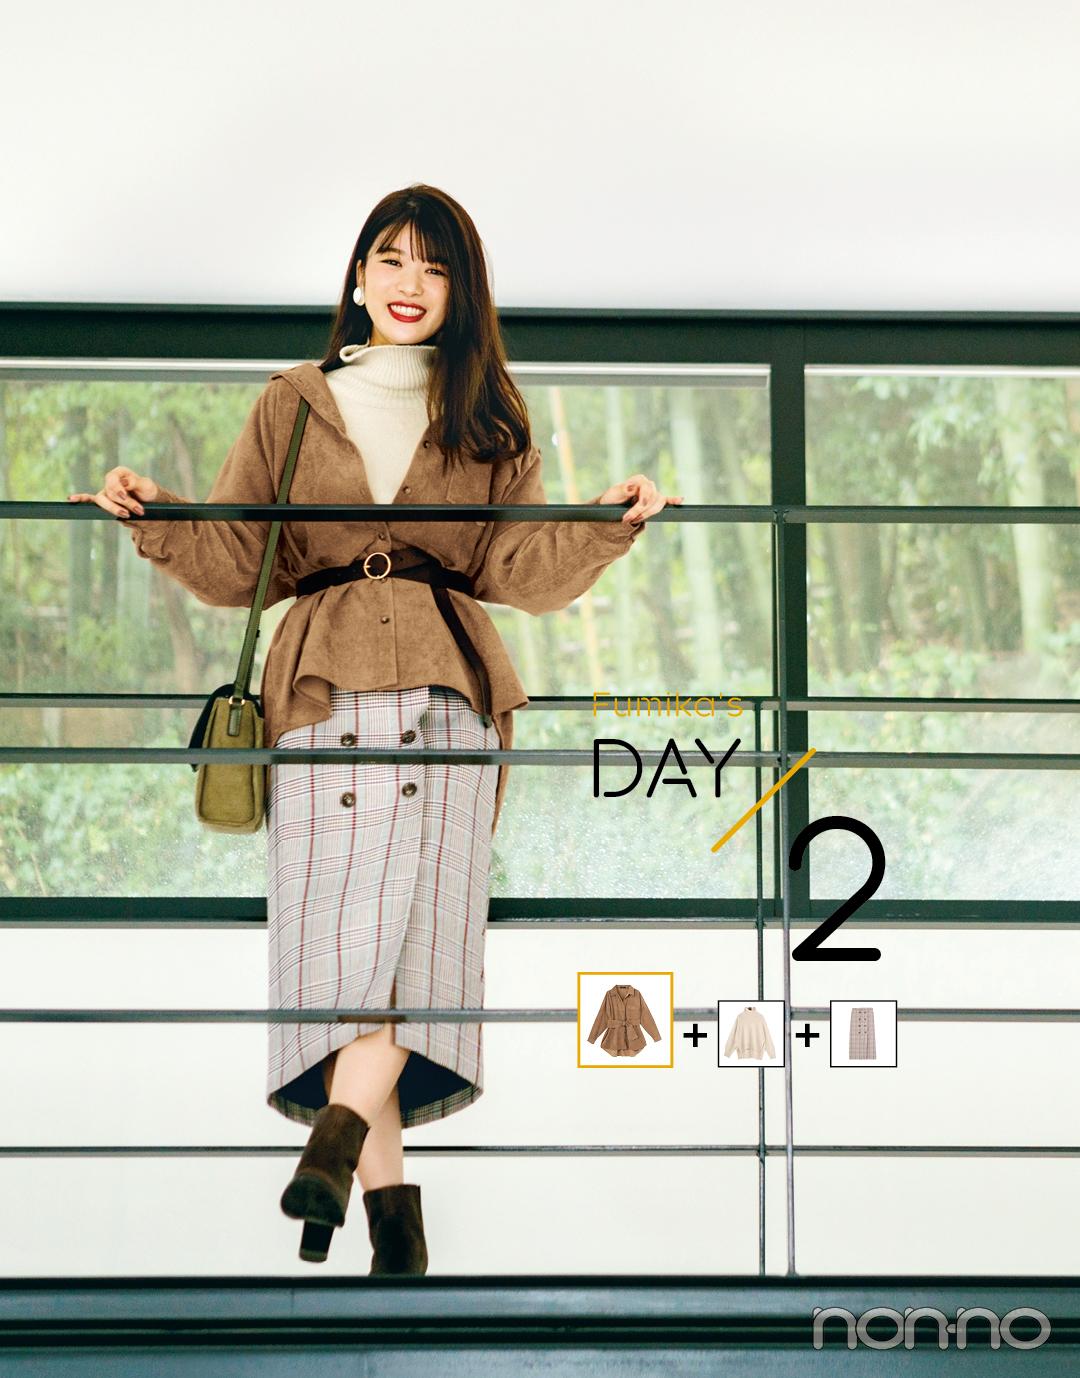 Fumika's DAY2